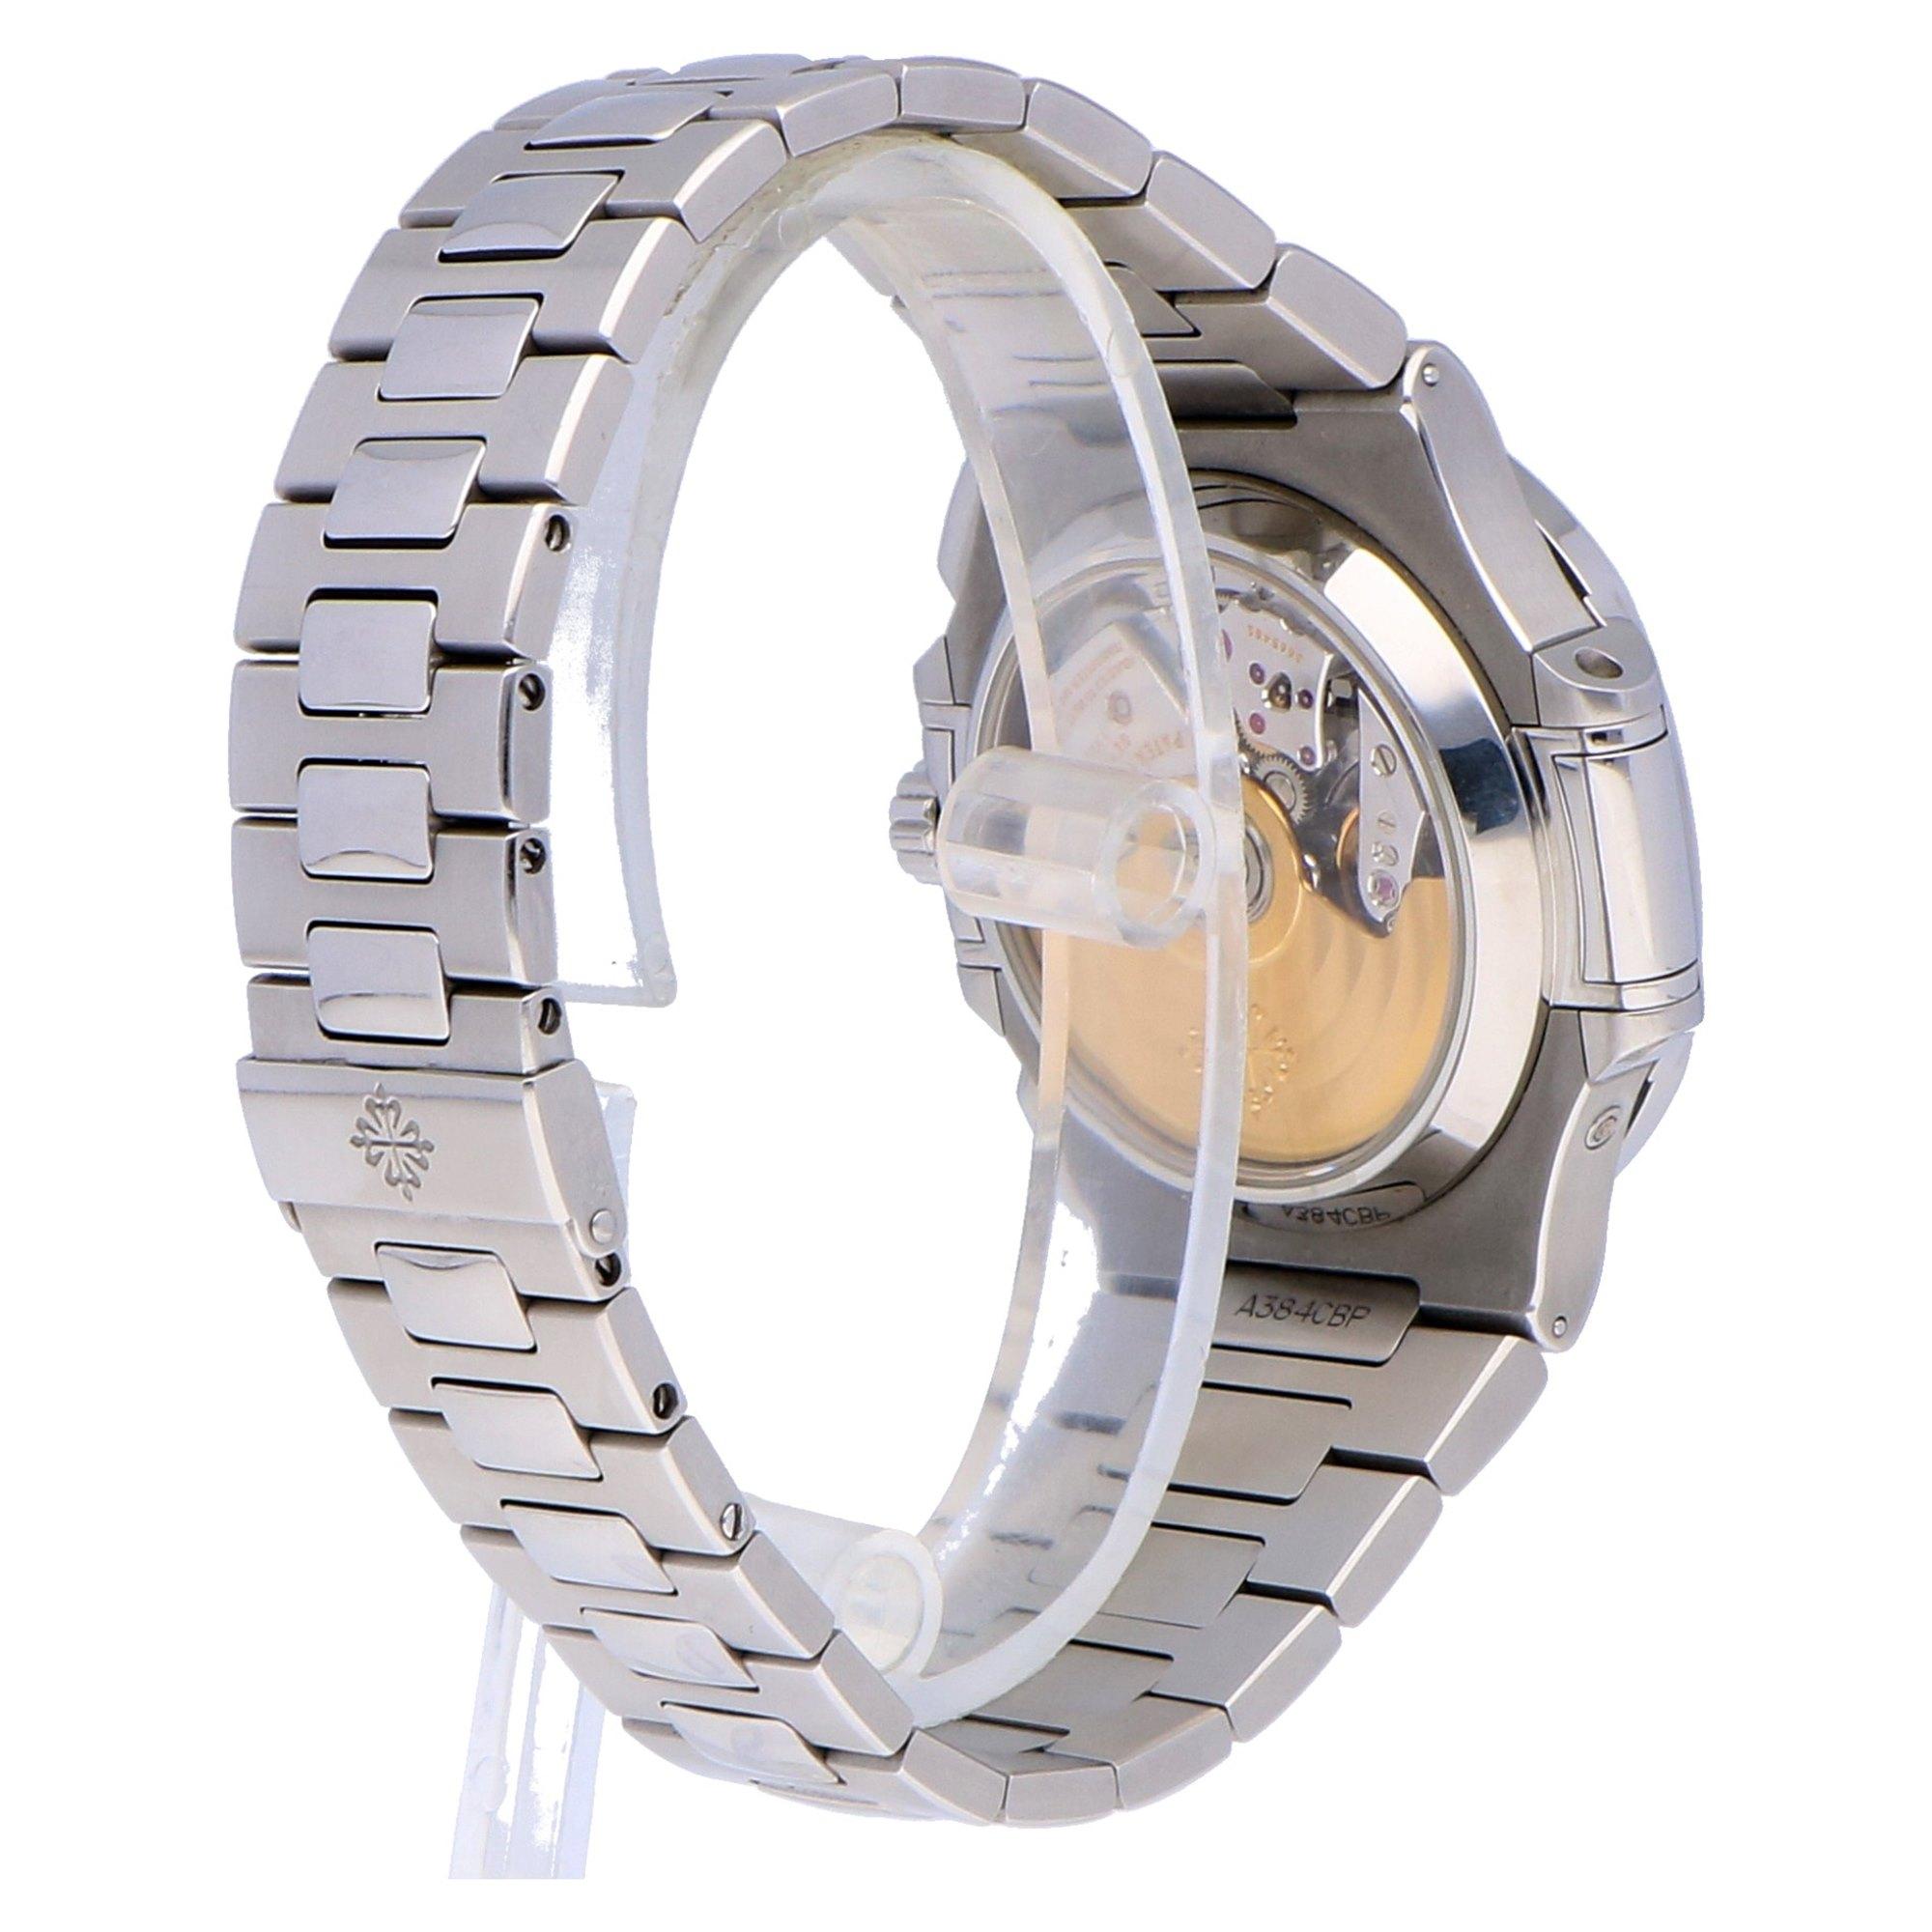 Patek Philippe Nautilus Stainless Steel 5980/1A-001